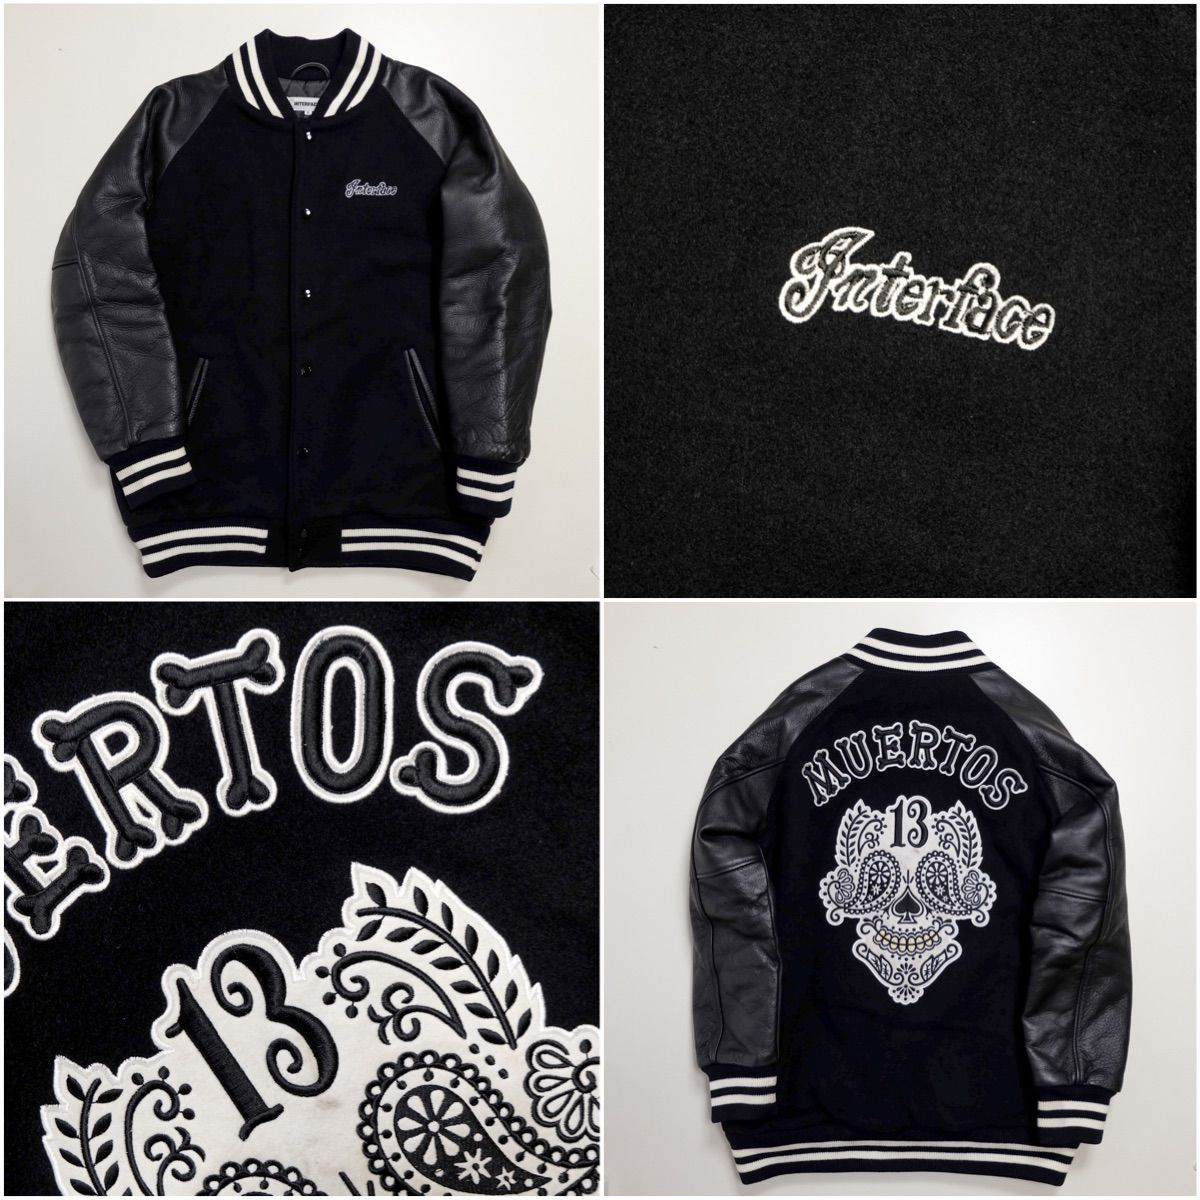 Philadelphia Eagles NFL Pro Line by Fanatics Branded Super Bowl LII  Champions Full-Snap Leather Jacket – Black  ed28947b2